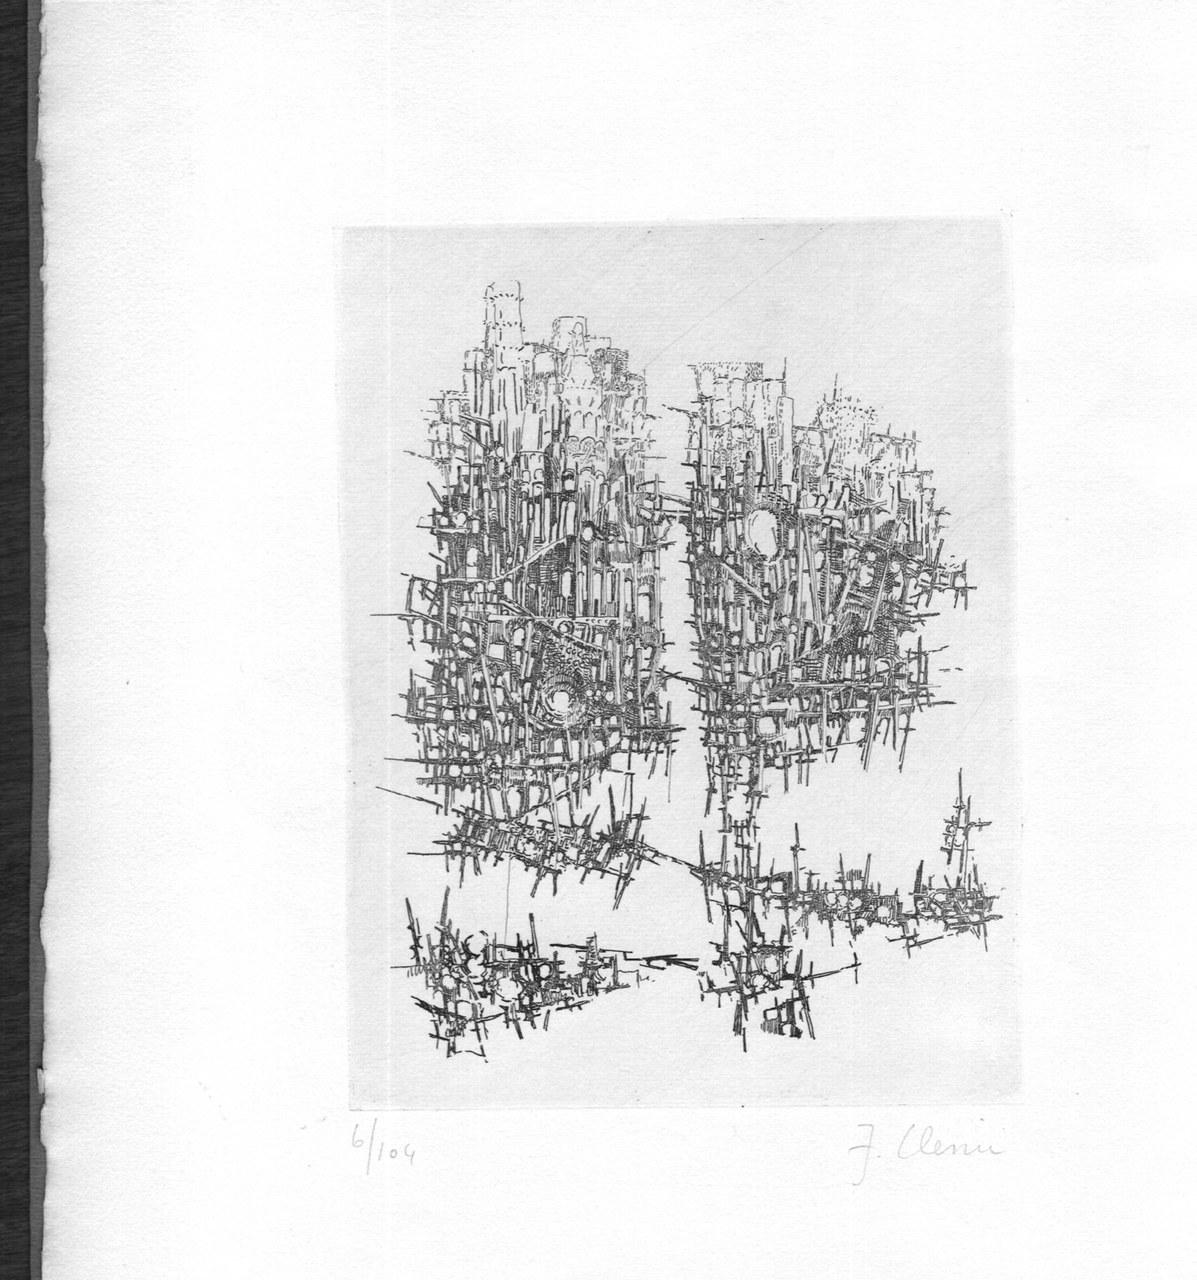 Acquaforte di Fabrizio Clerici per Salinas, 1958